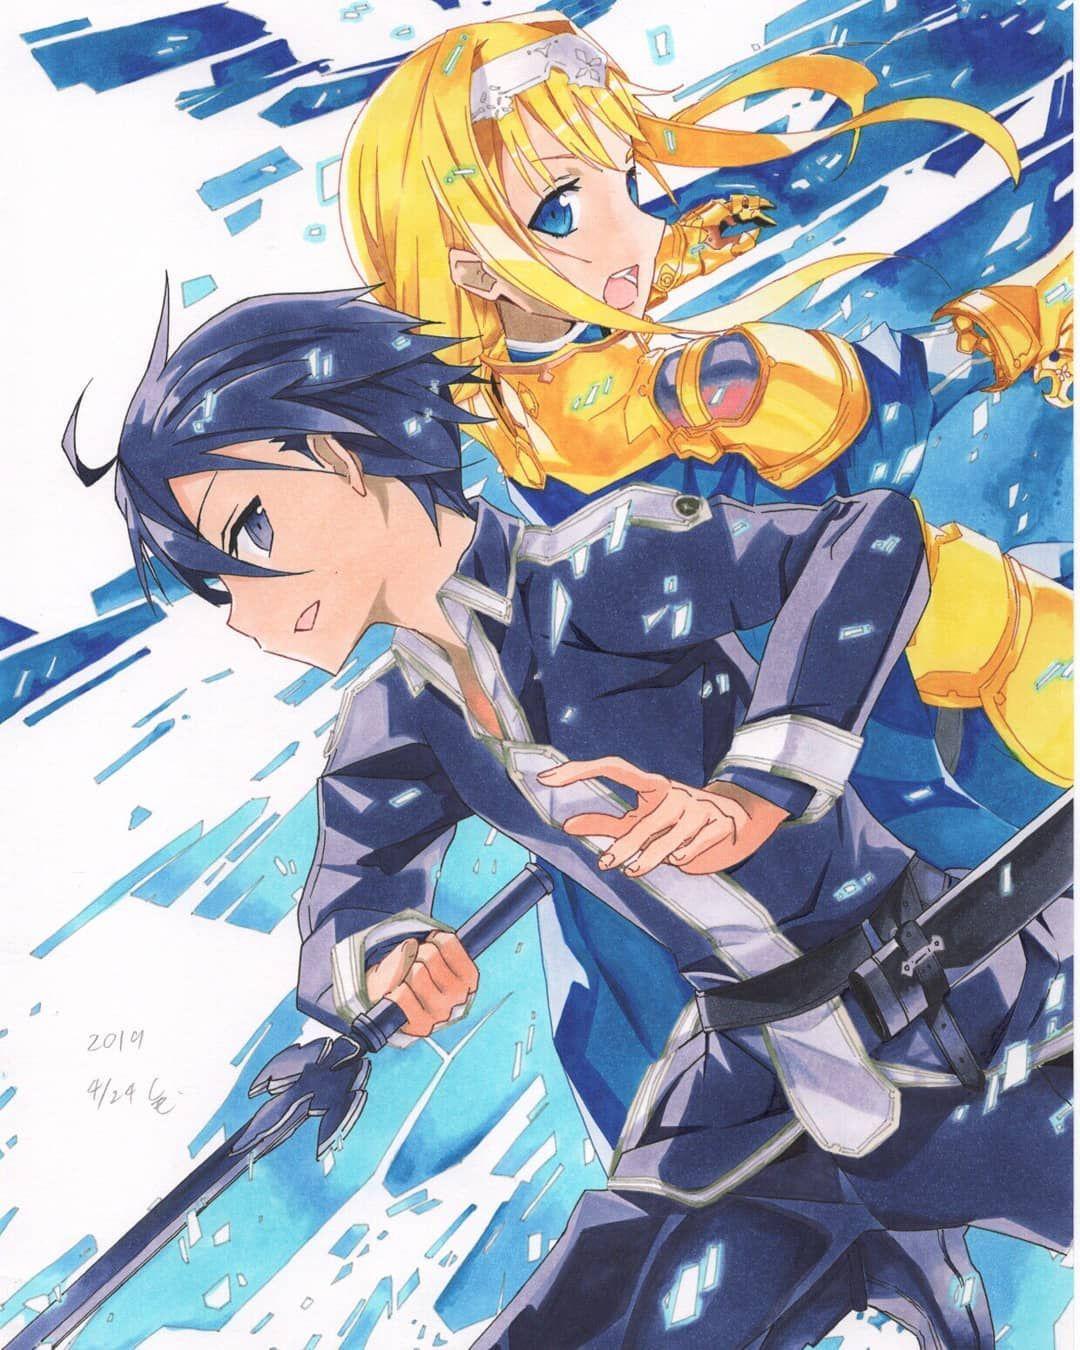 licization trên Instagra Sword art online, Light novel